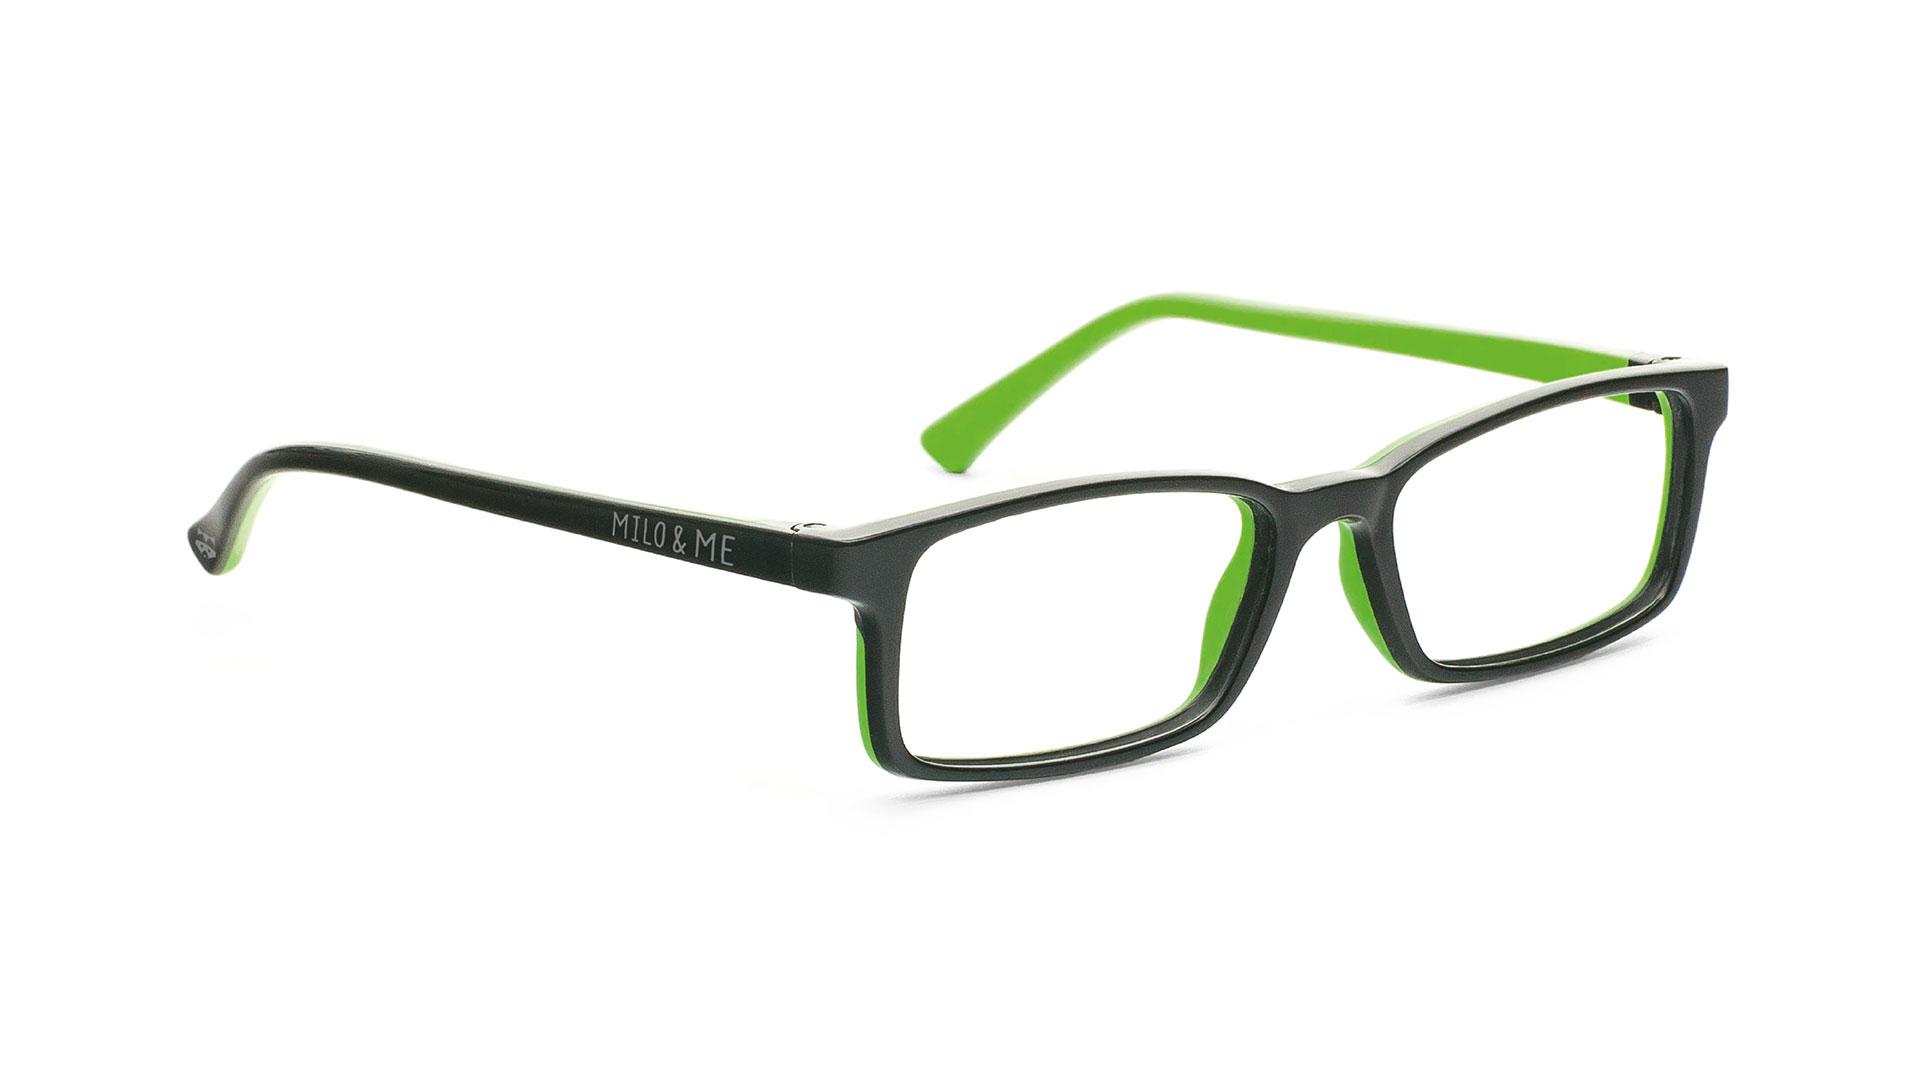 BlackApple Green H85020-12 - Milo & Me Eyewear - Optimum RX Lens Specialists